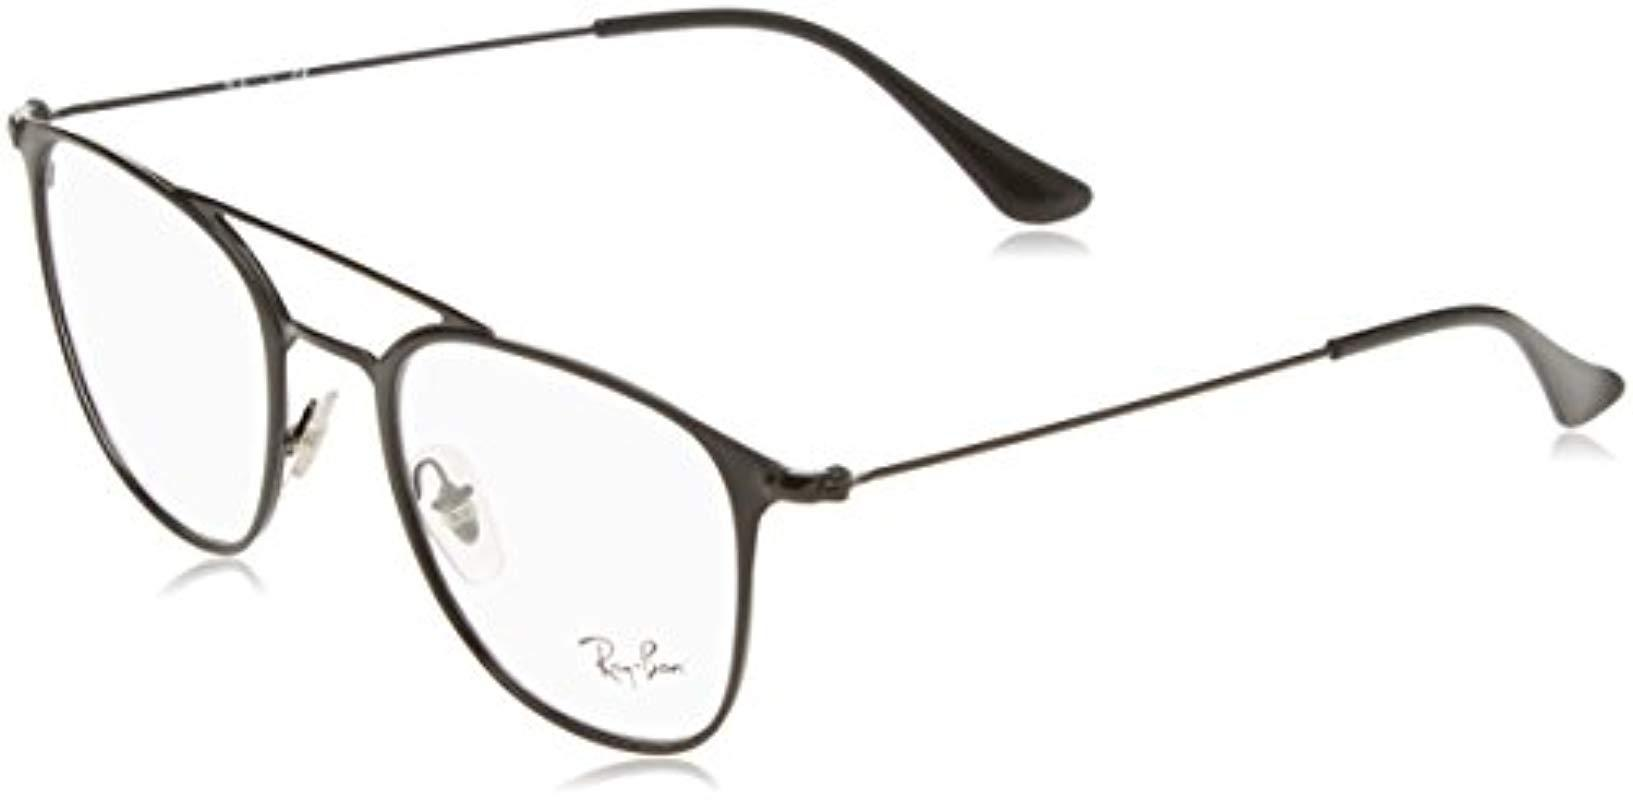 ecacb9e1ce Ray-Ban Unisex-adults 6377 Optical Frames